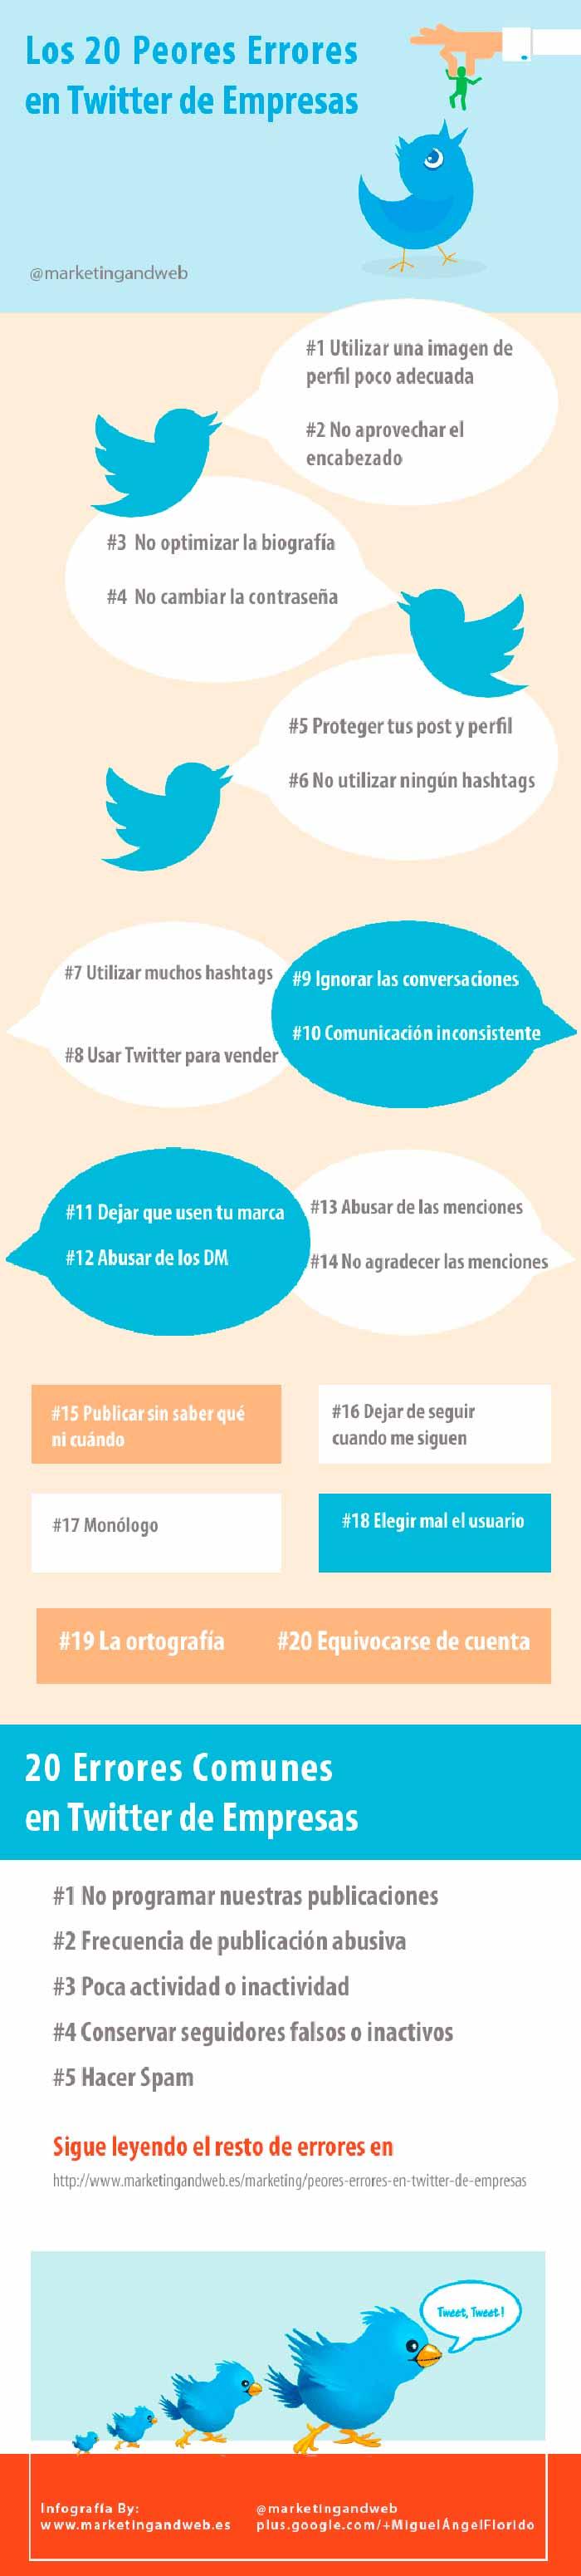 Infografia sobre los peores errores en Twitter de empresas